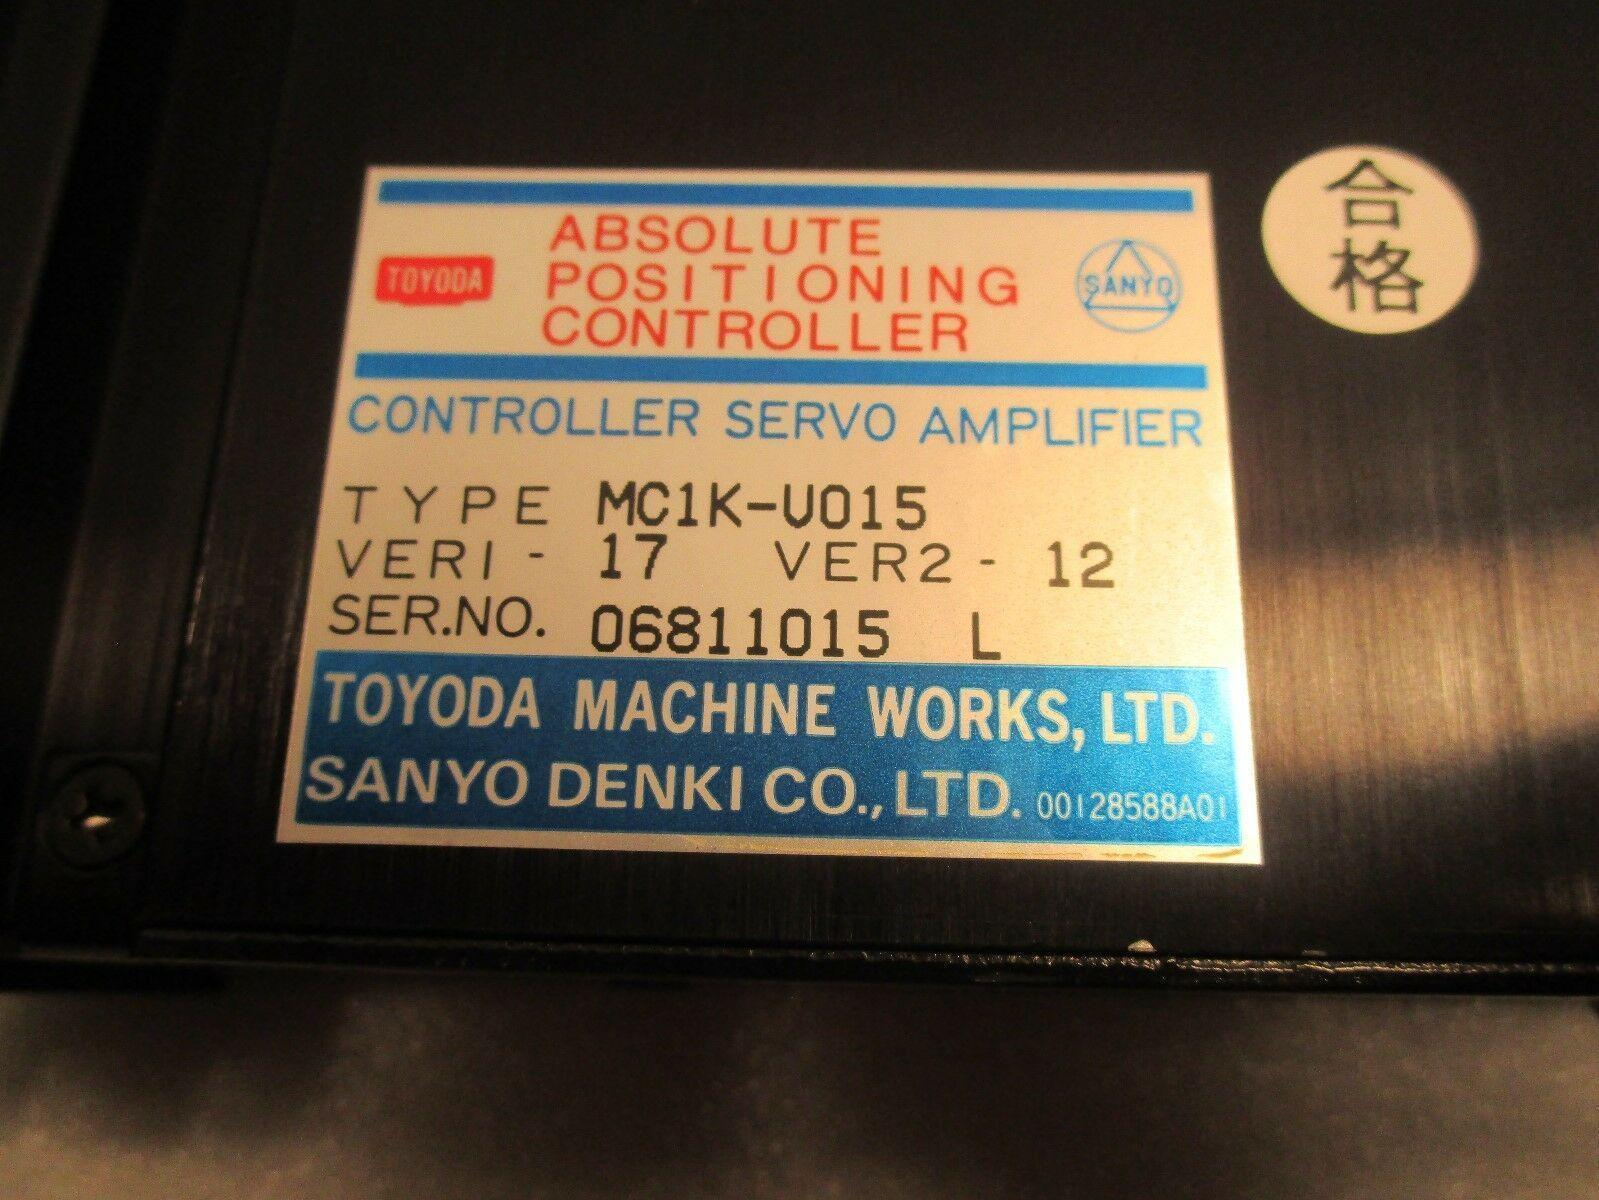 Toyoda Sanyo Denki Axis Drive Absolute Positioning Controller MC1K-U015